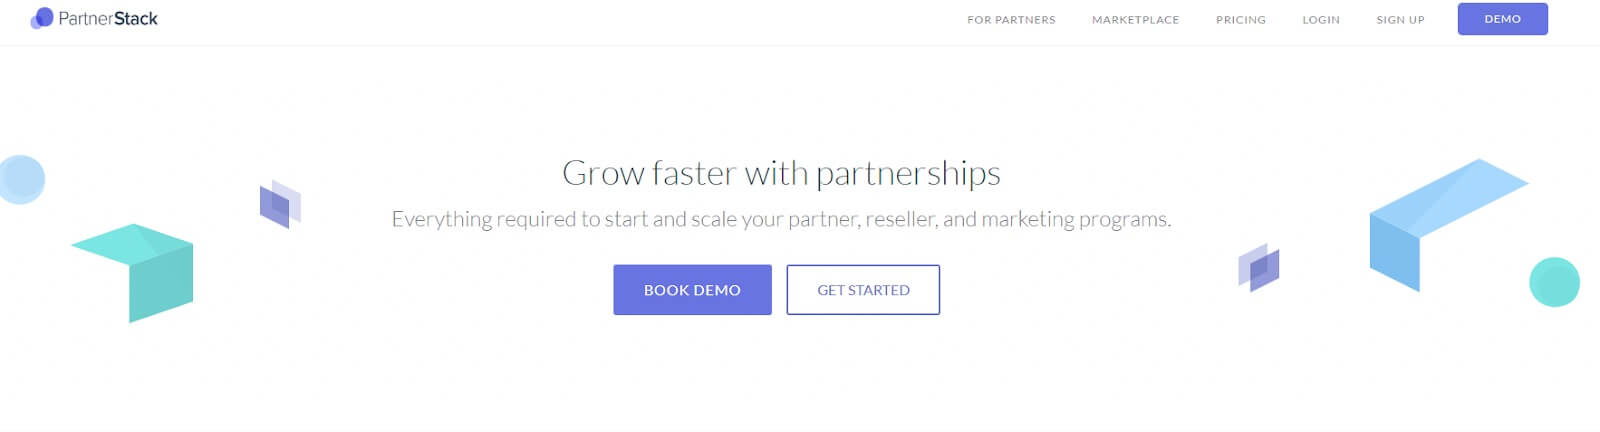 partnerstack affiliates programs - Outbrain Blog